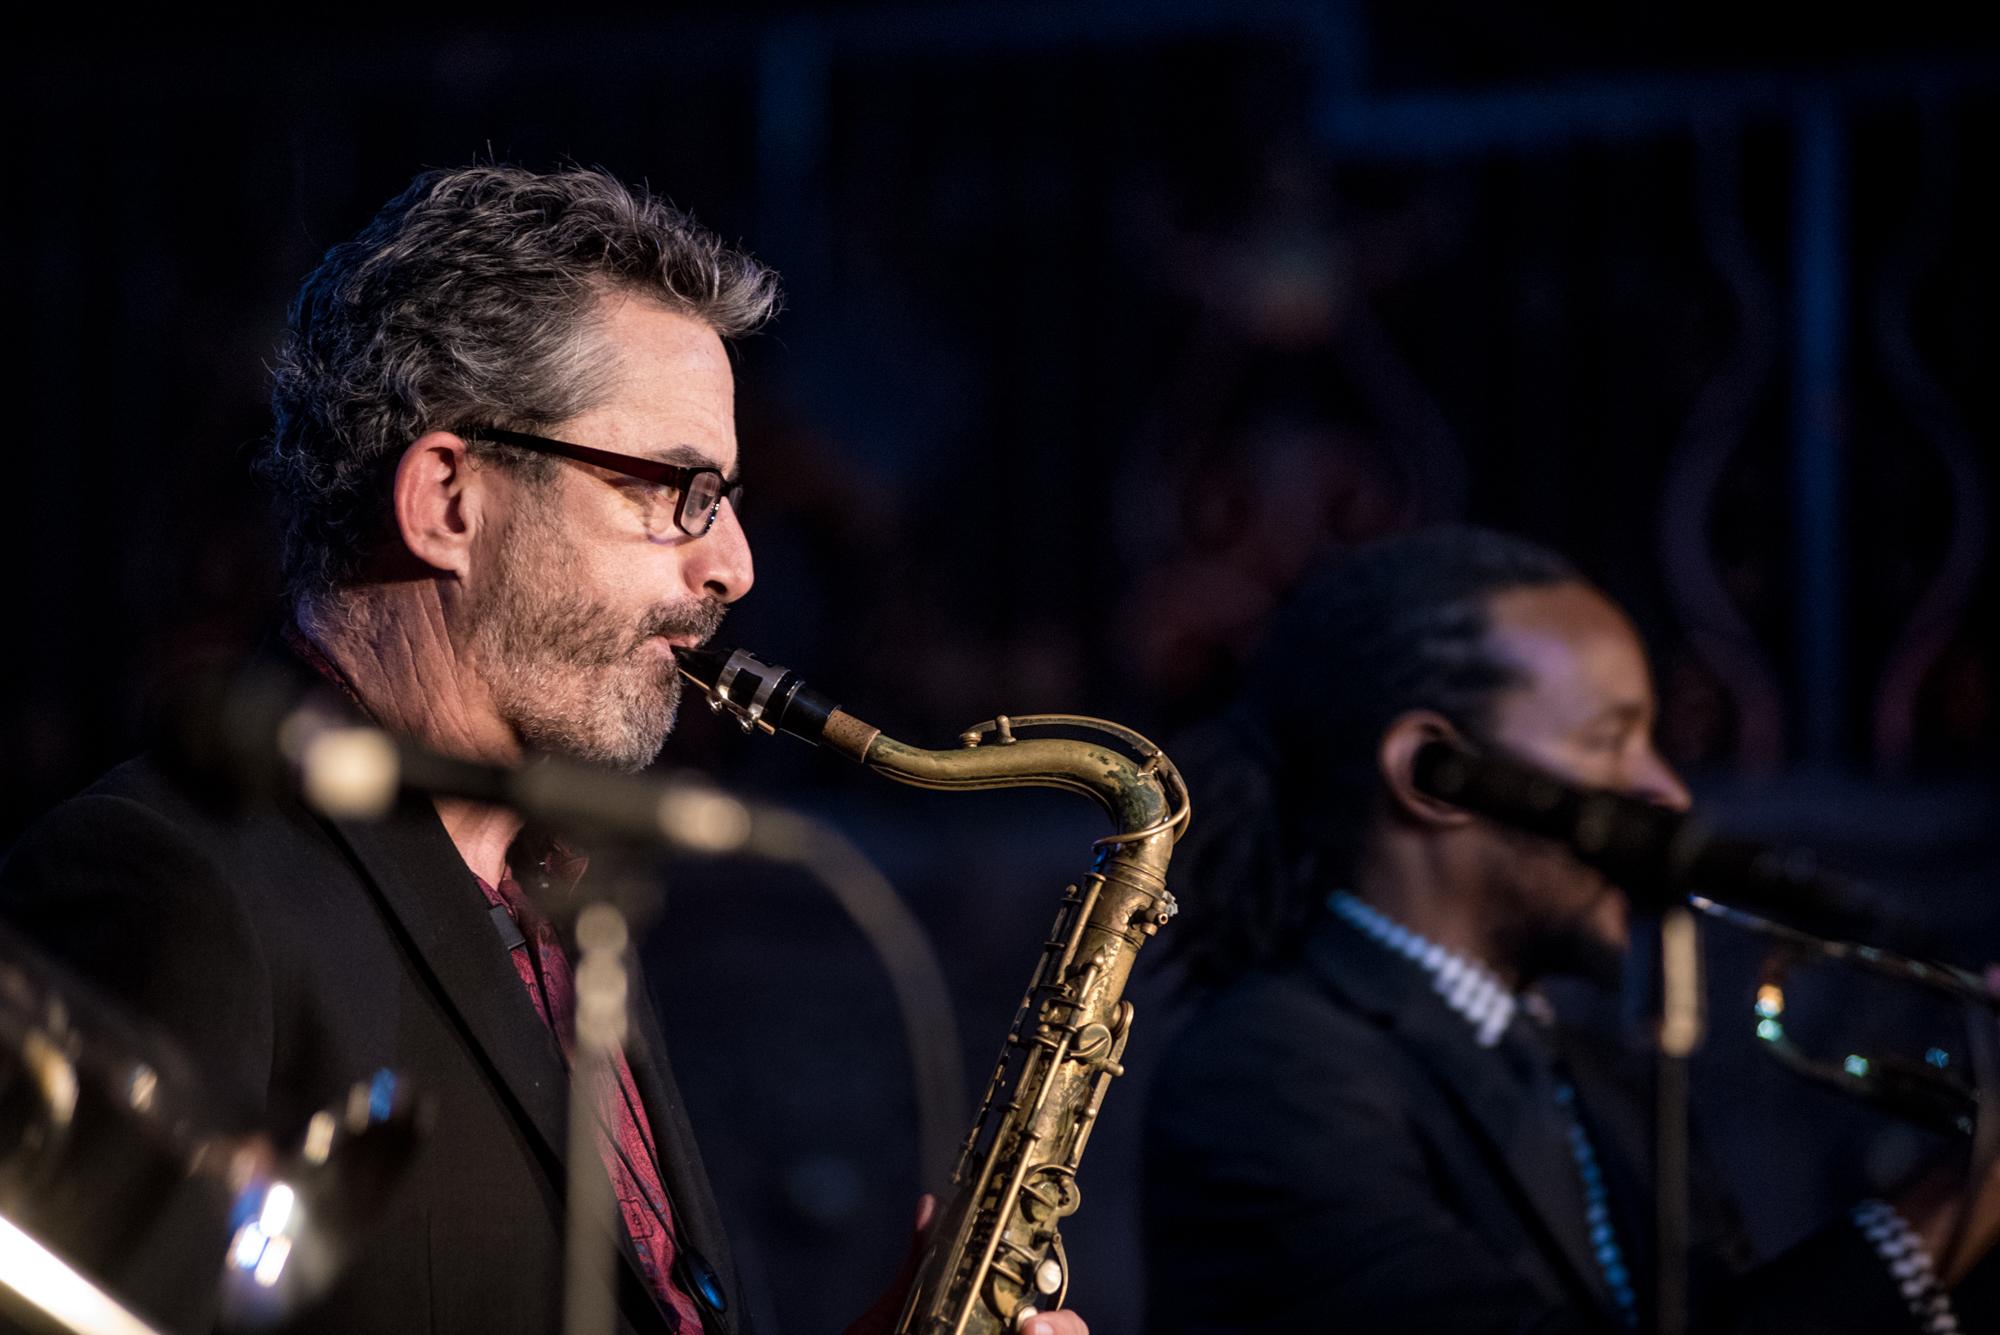 Matthew Demerritt: The Mudbug Brass Band